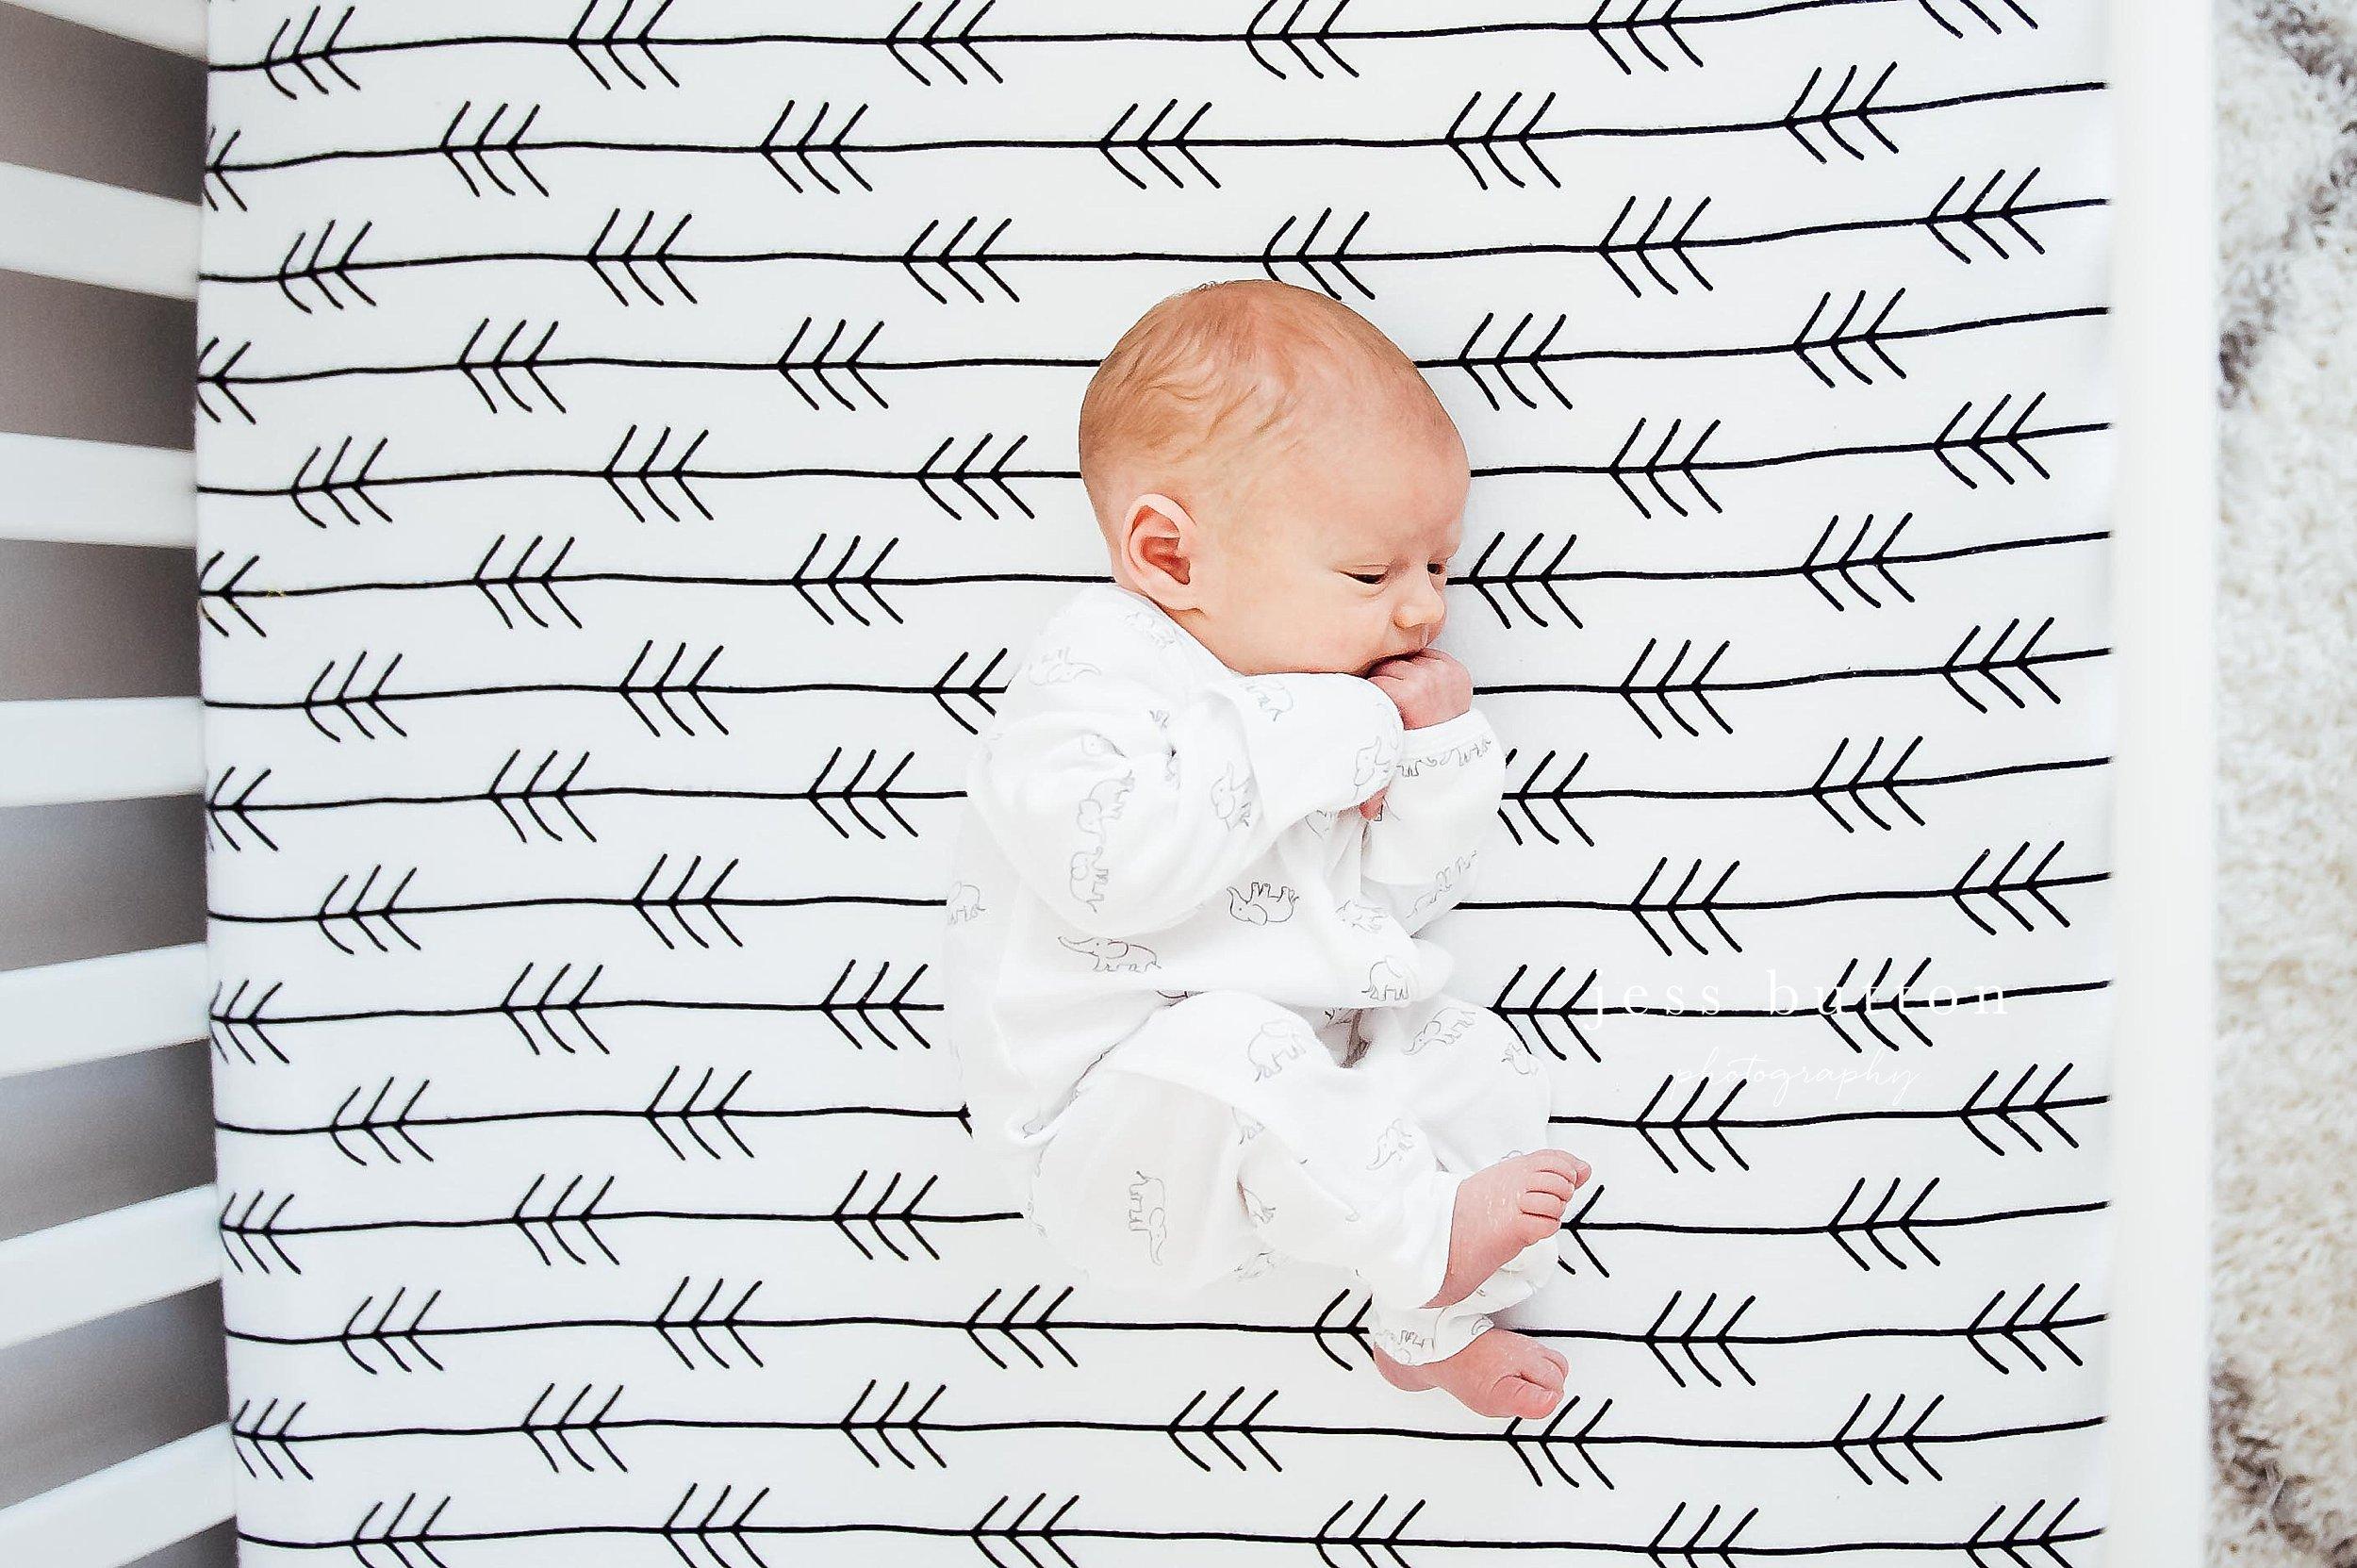 awake baby boy in crib - Niagara newborn photographer